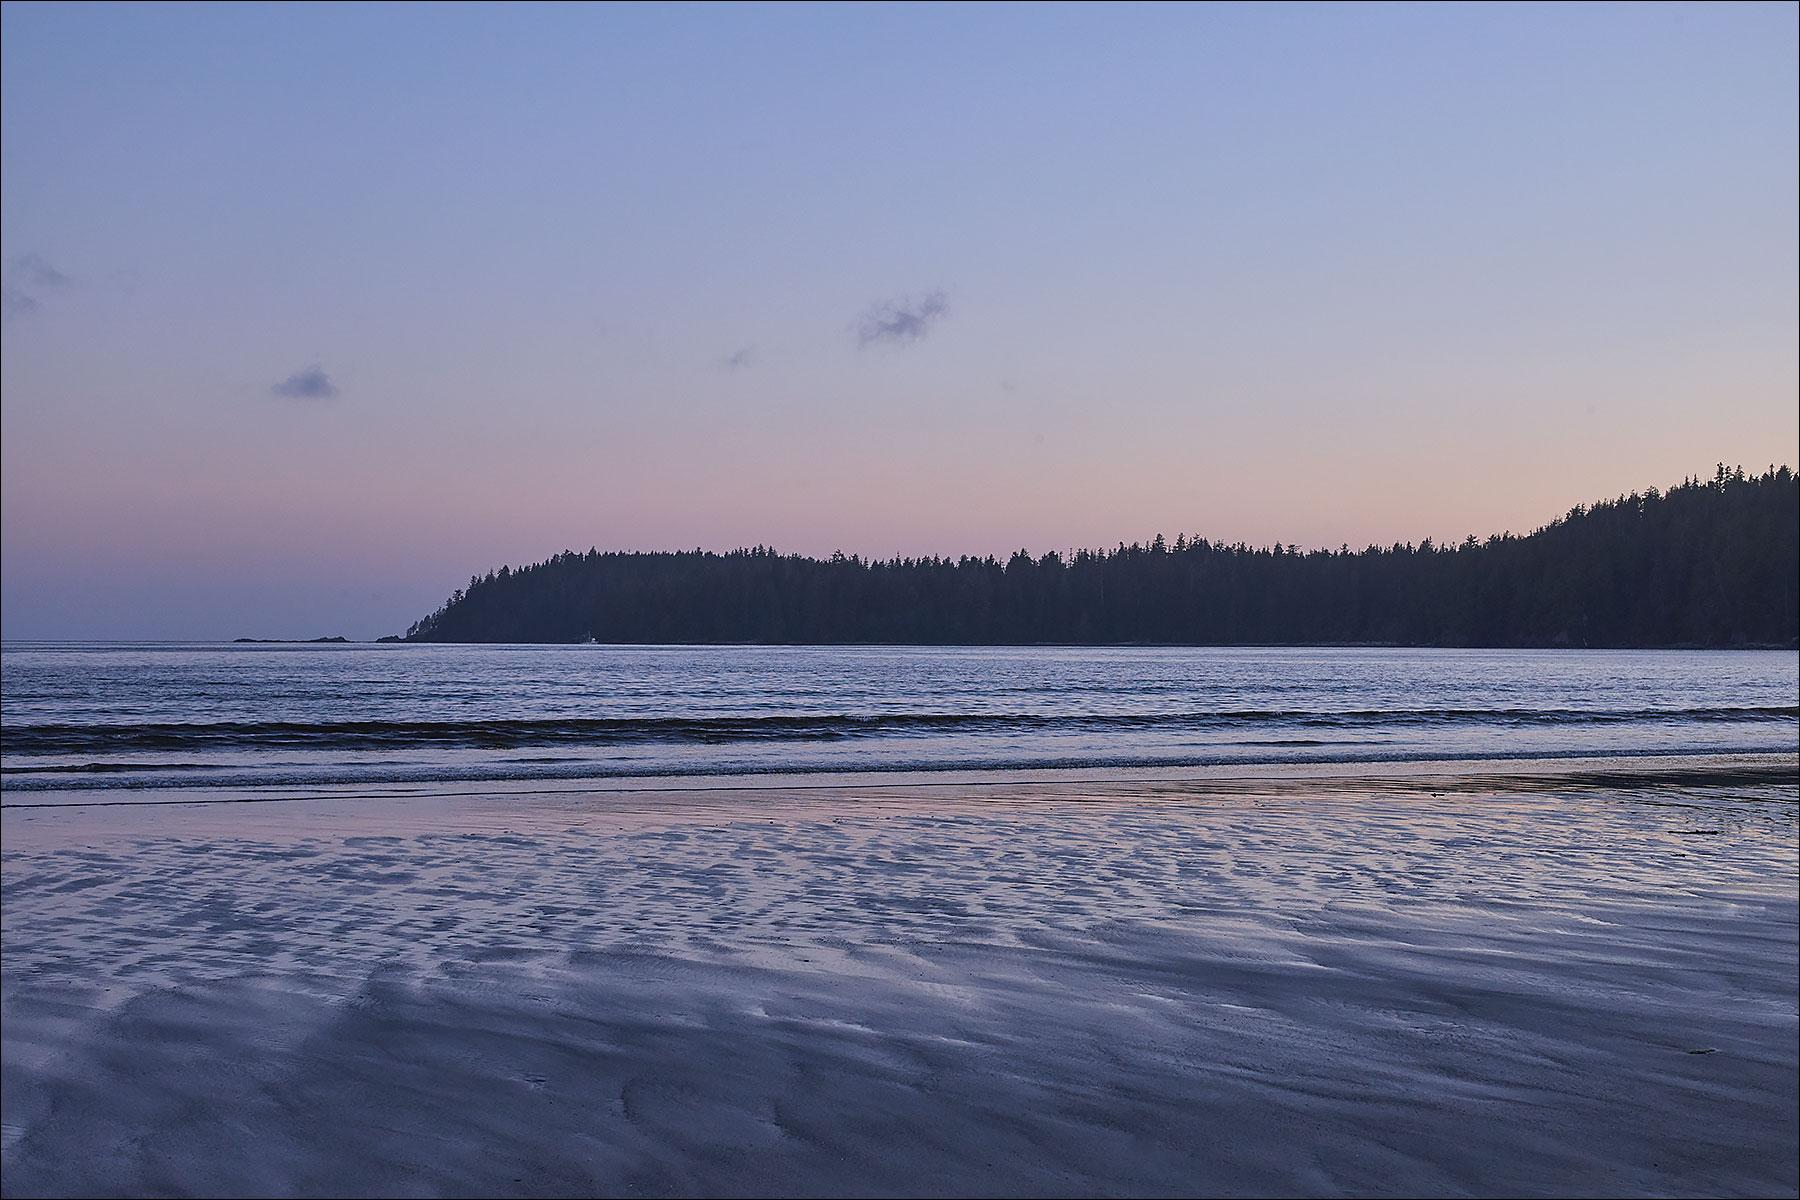 Pachena Bay Beach ©johncameorn.ca